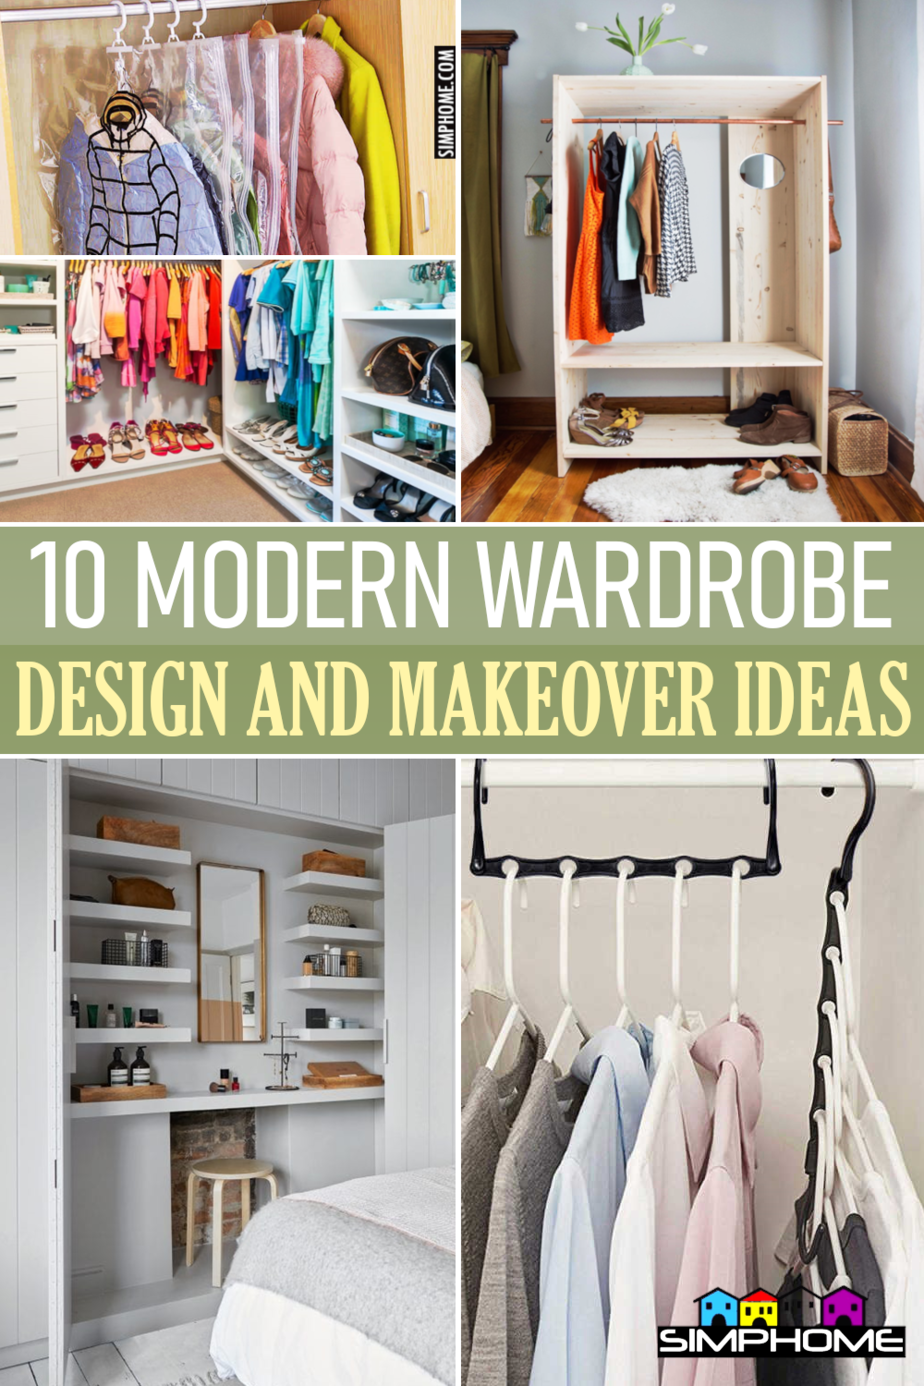 10 Modern Wardrobe Design and Makeover Ideas via Simphome.comFeatured